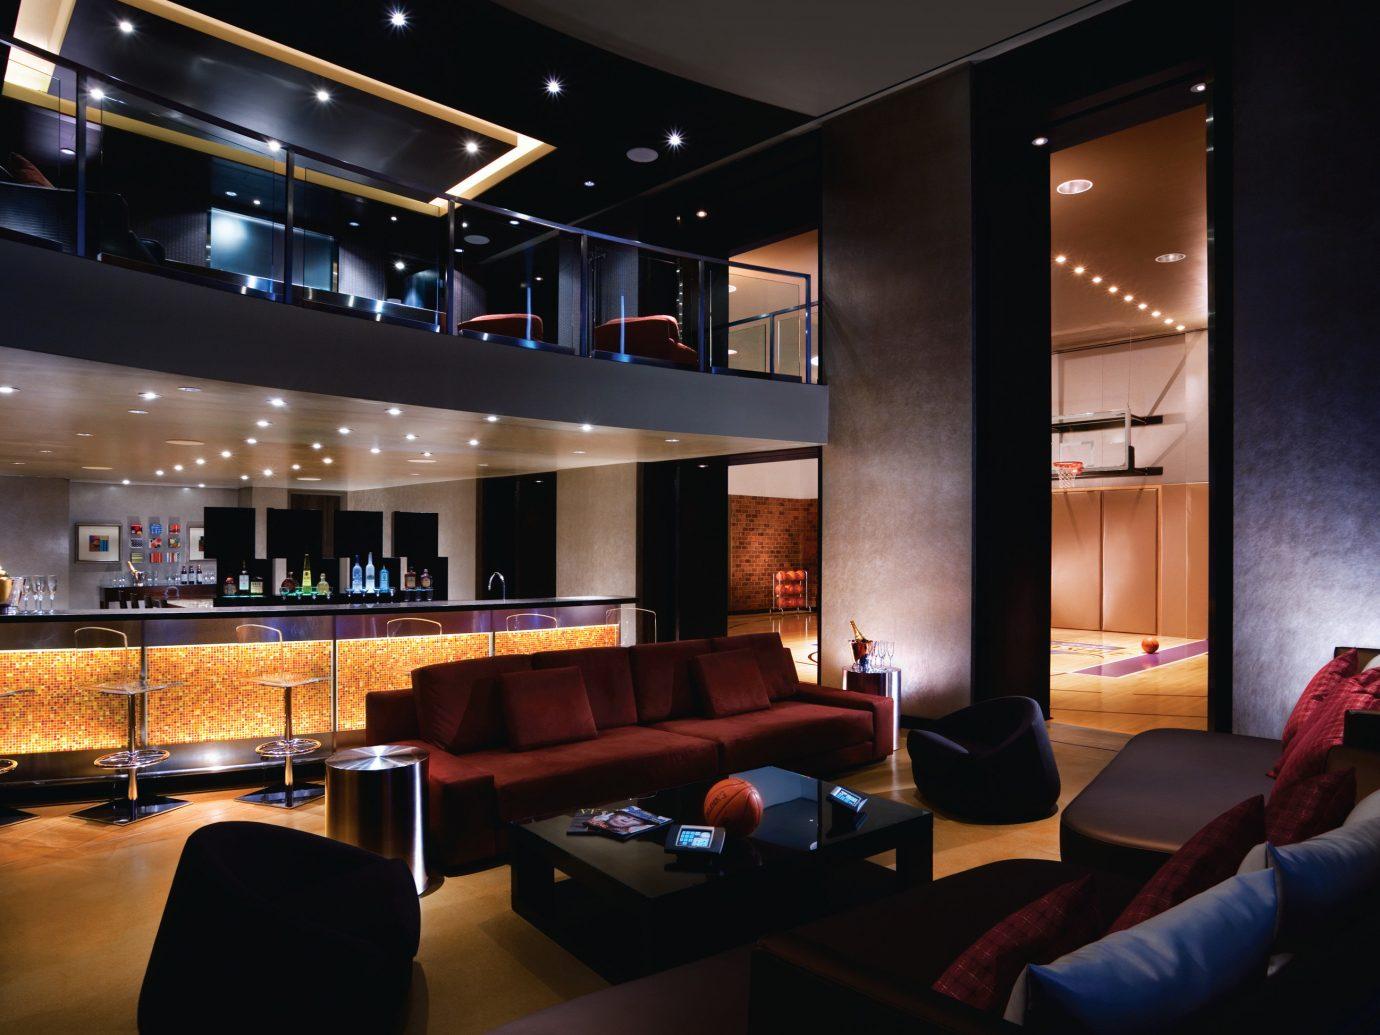 Hotels Luxury Travel indoor room floor wall ceiling Living interior design Lobby lighting living room furniture interior designer area flat Modern